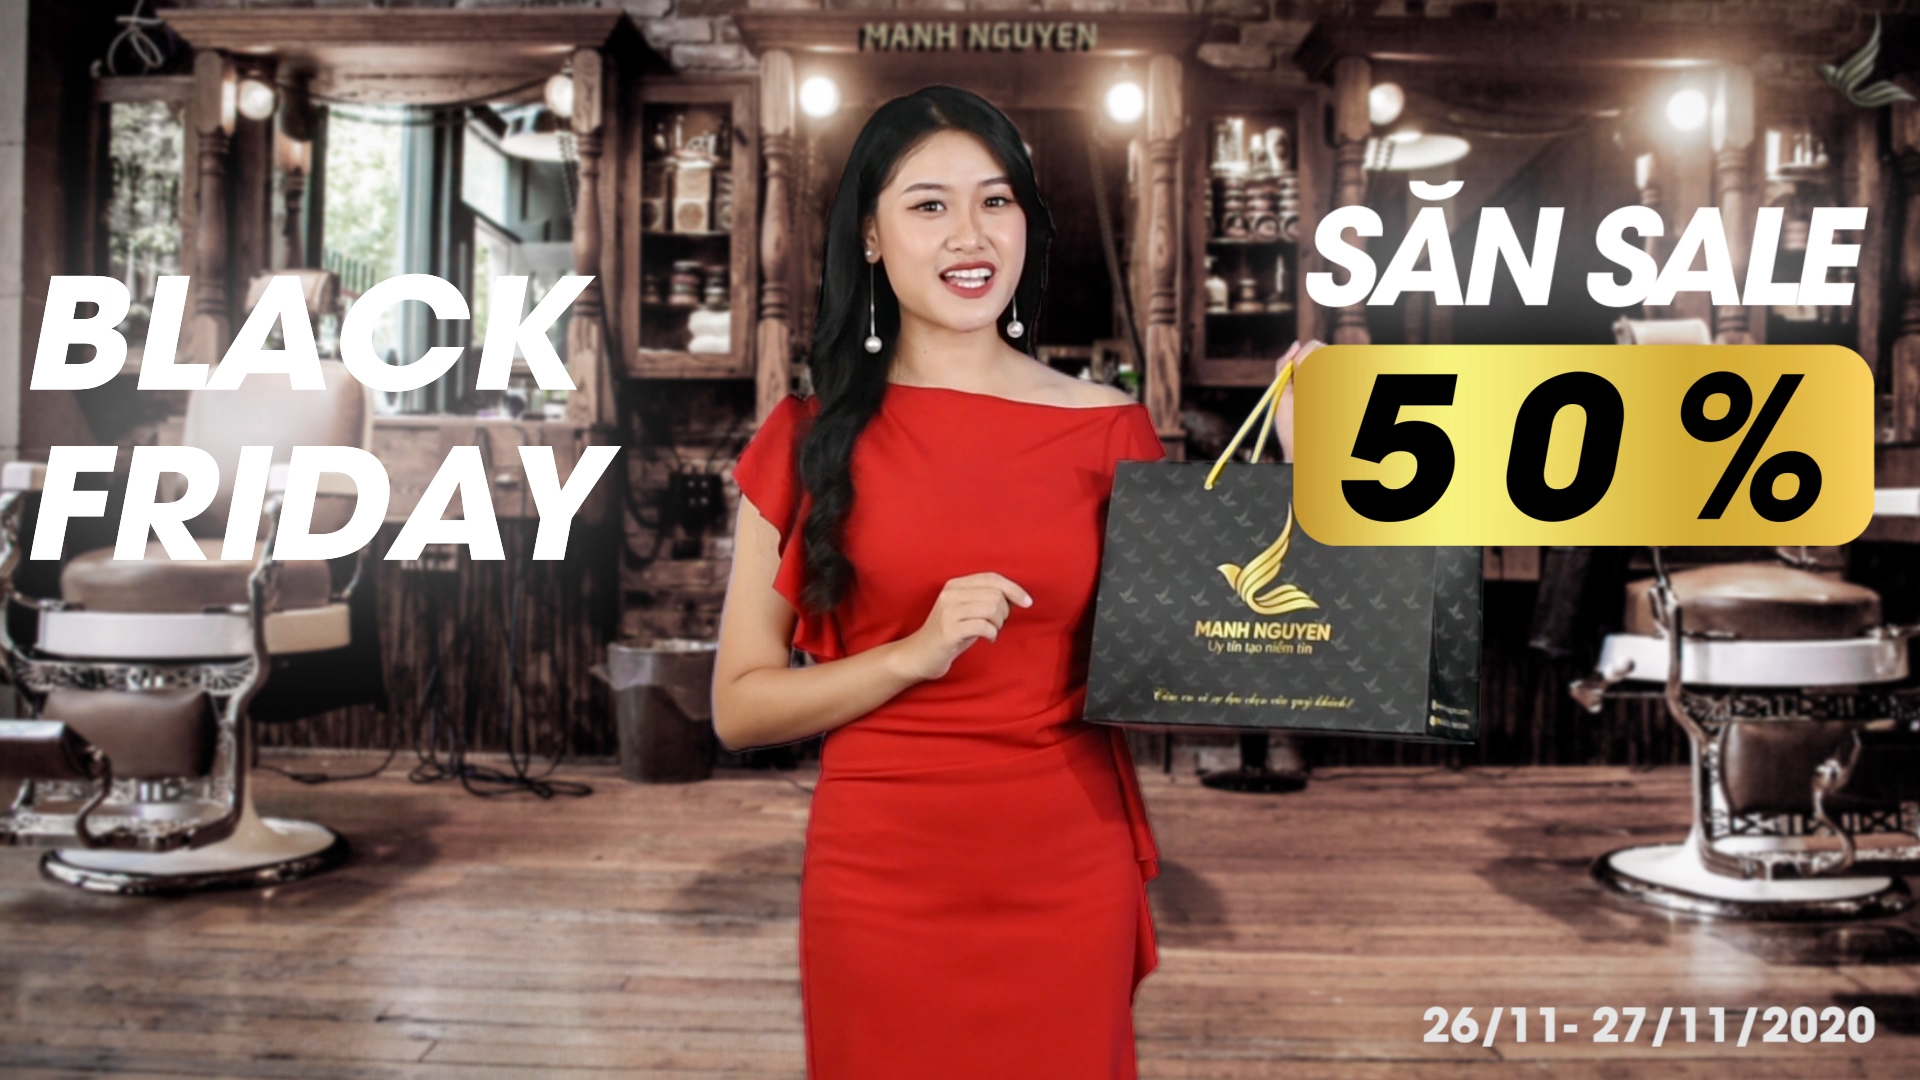 backfriday san sale len den 50% tai manh nguyen